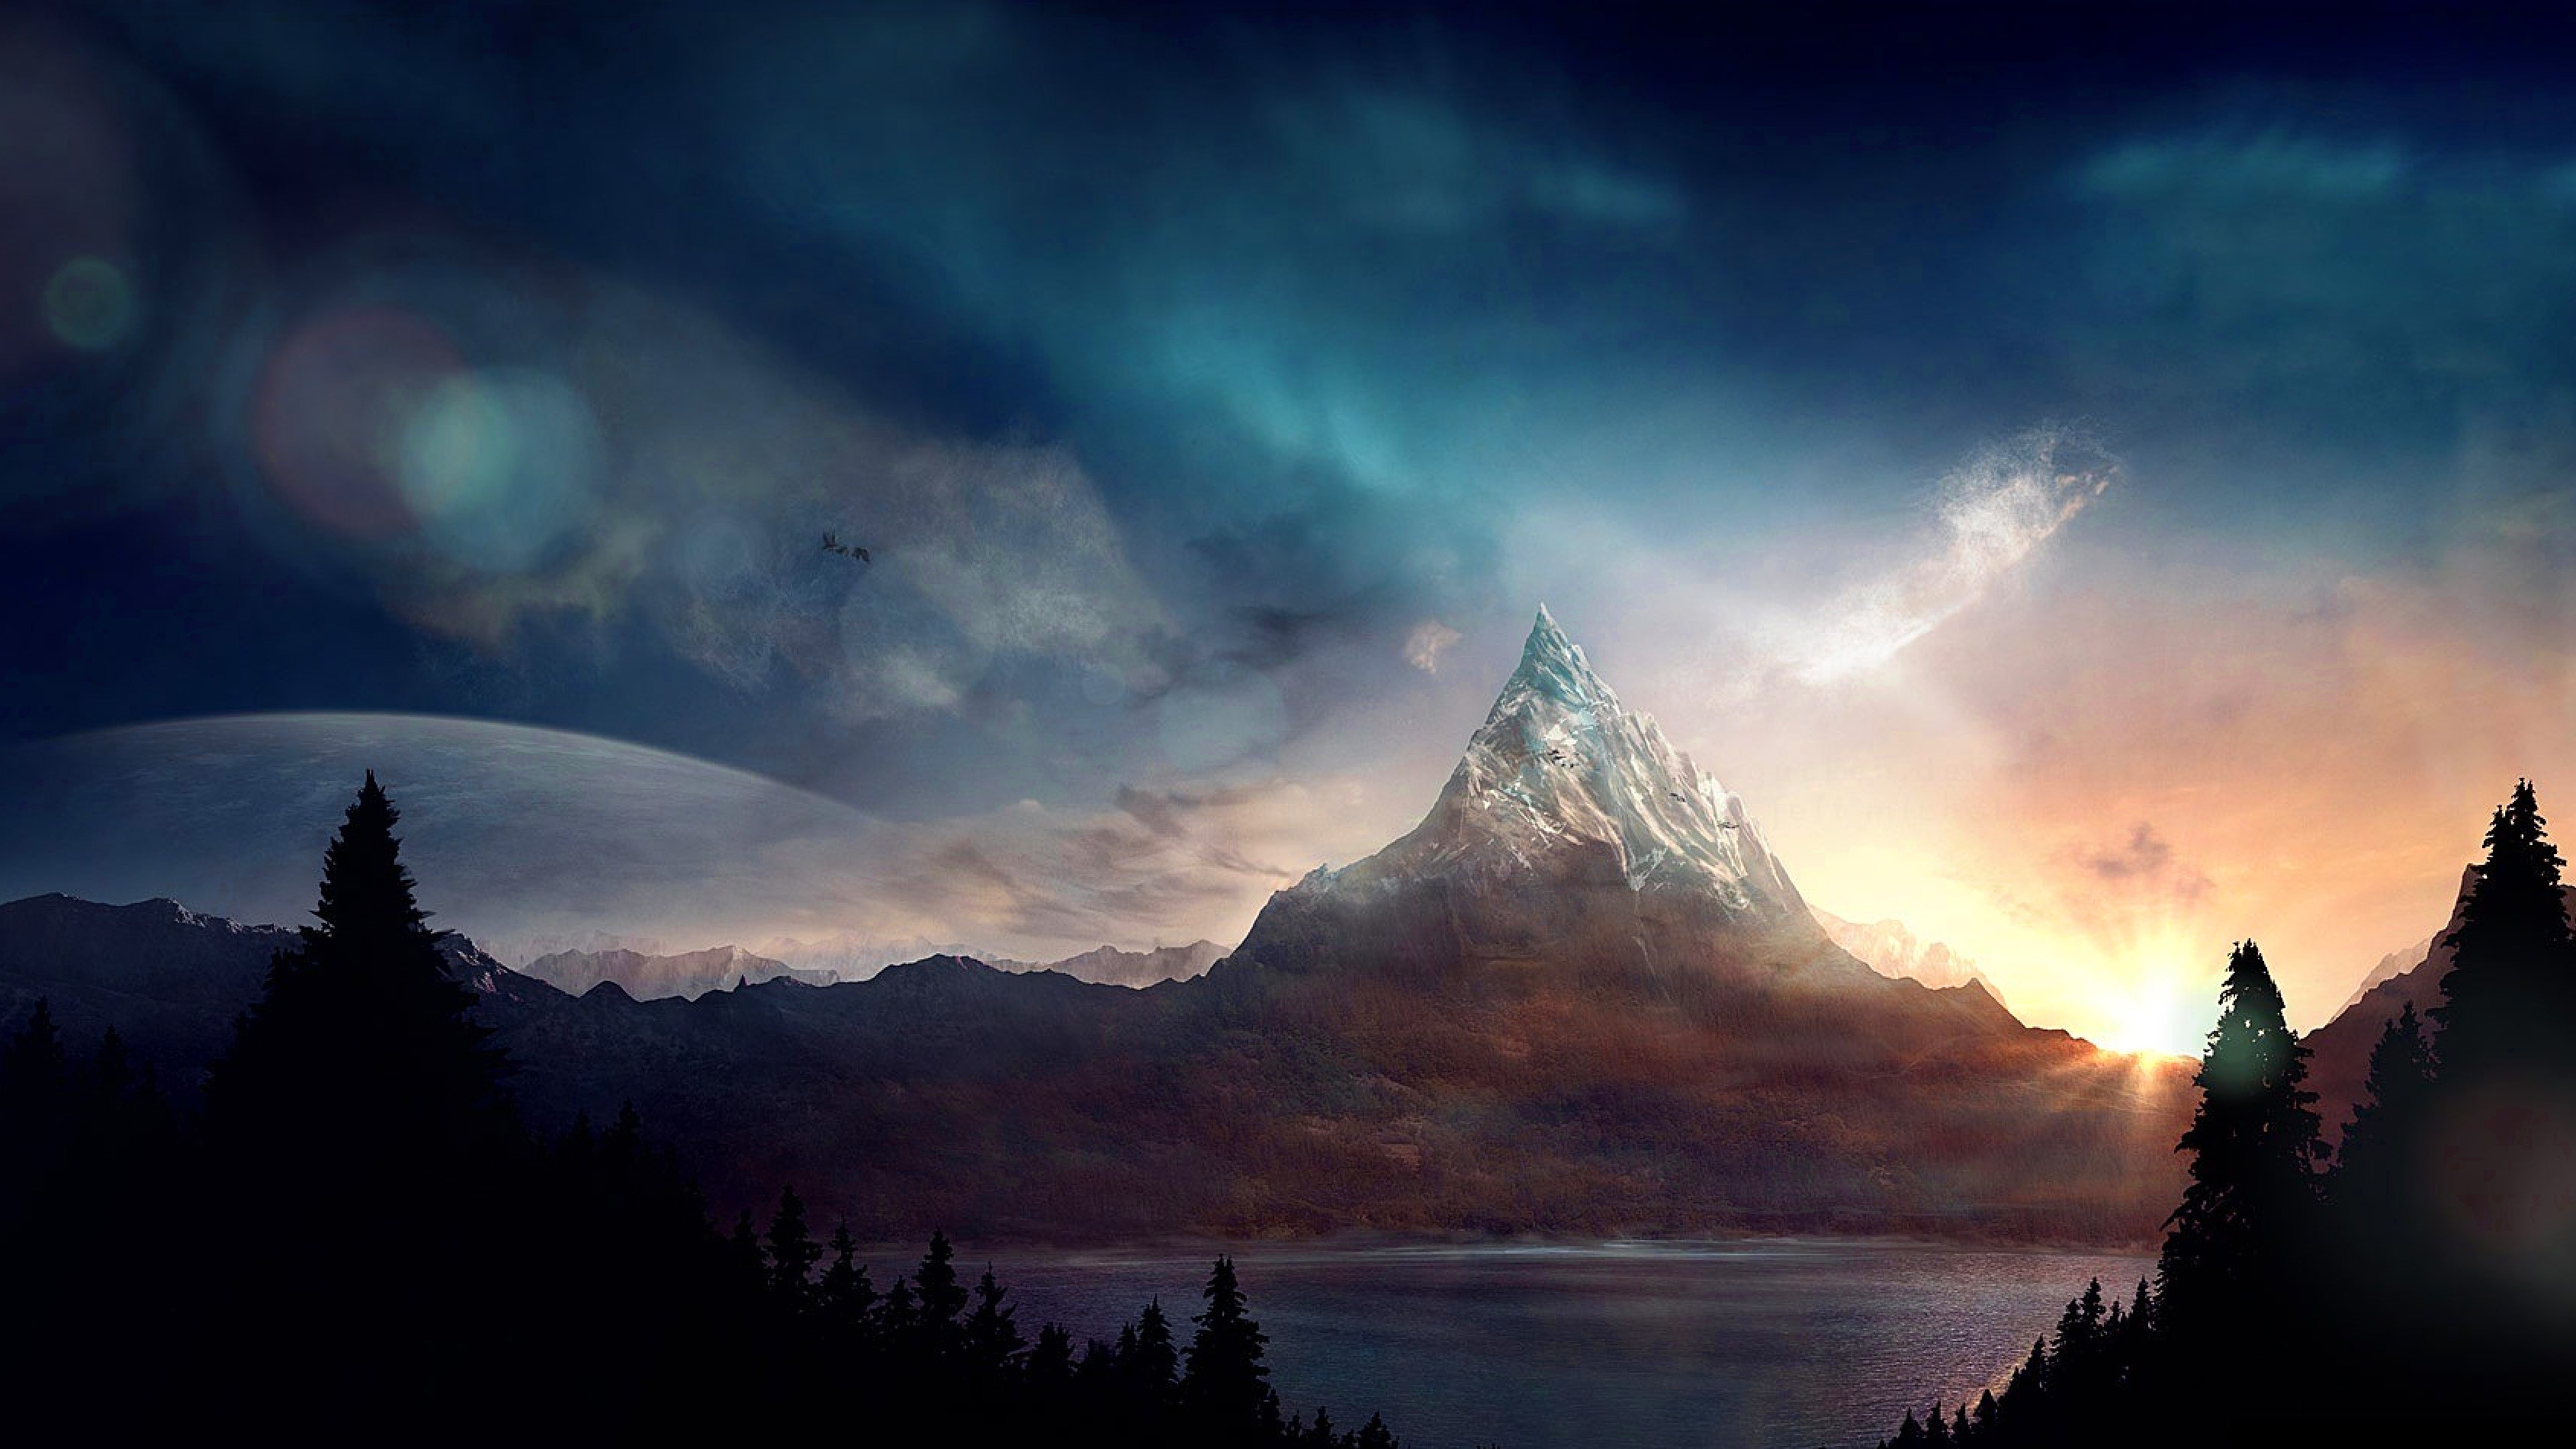 Ar91 Mountain Nature Fantasy Art Illustration Wallpaper